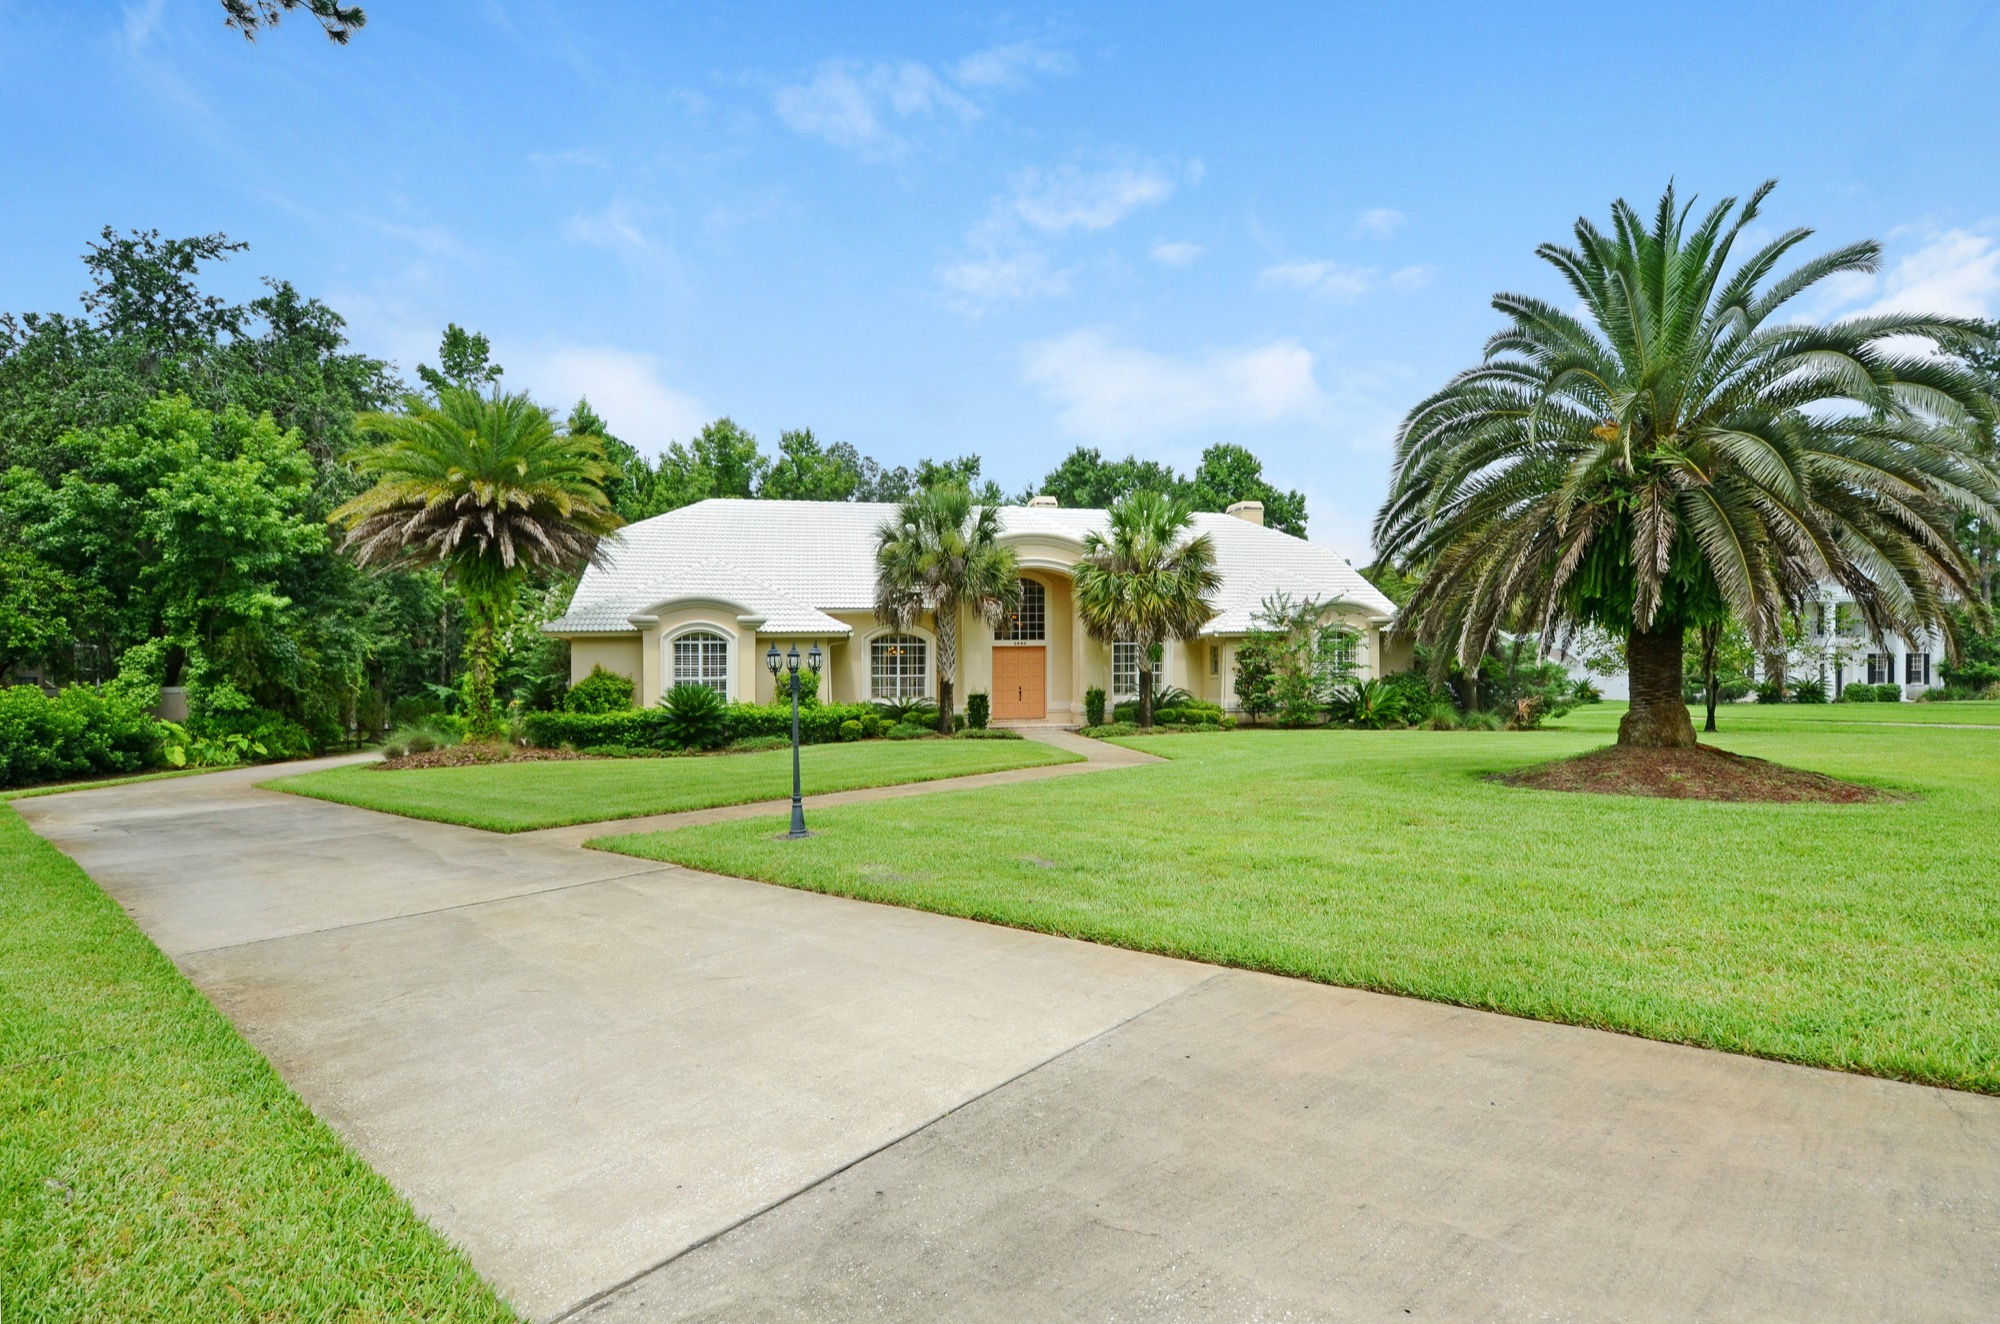 2493 River Tree Cir Sanford FL, 32771